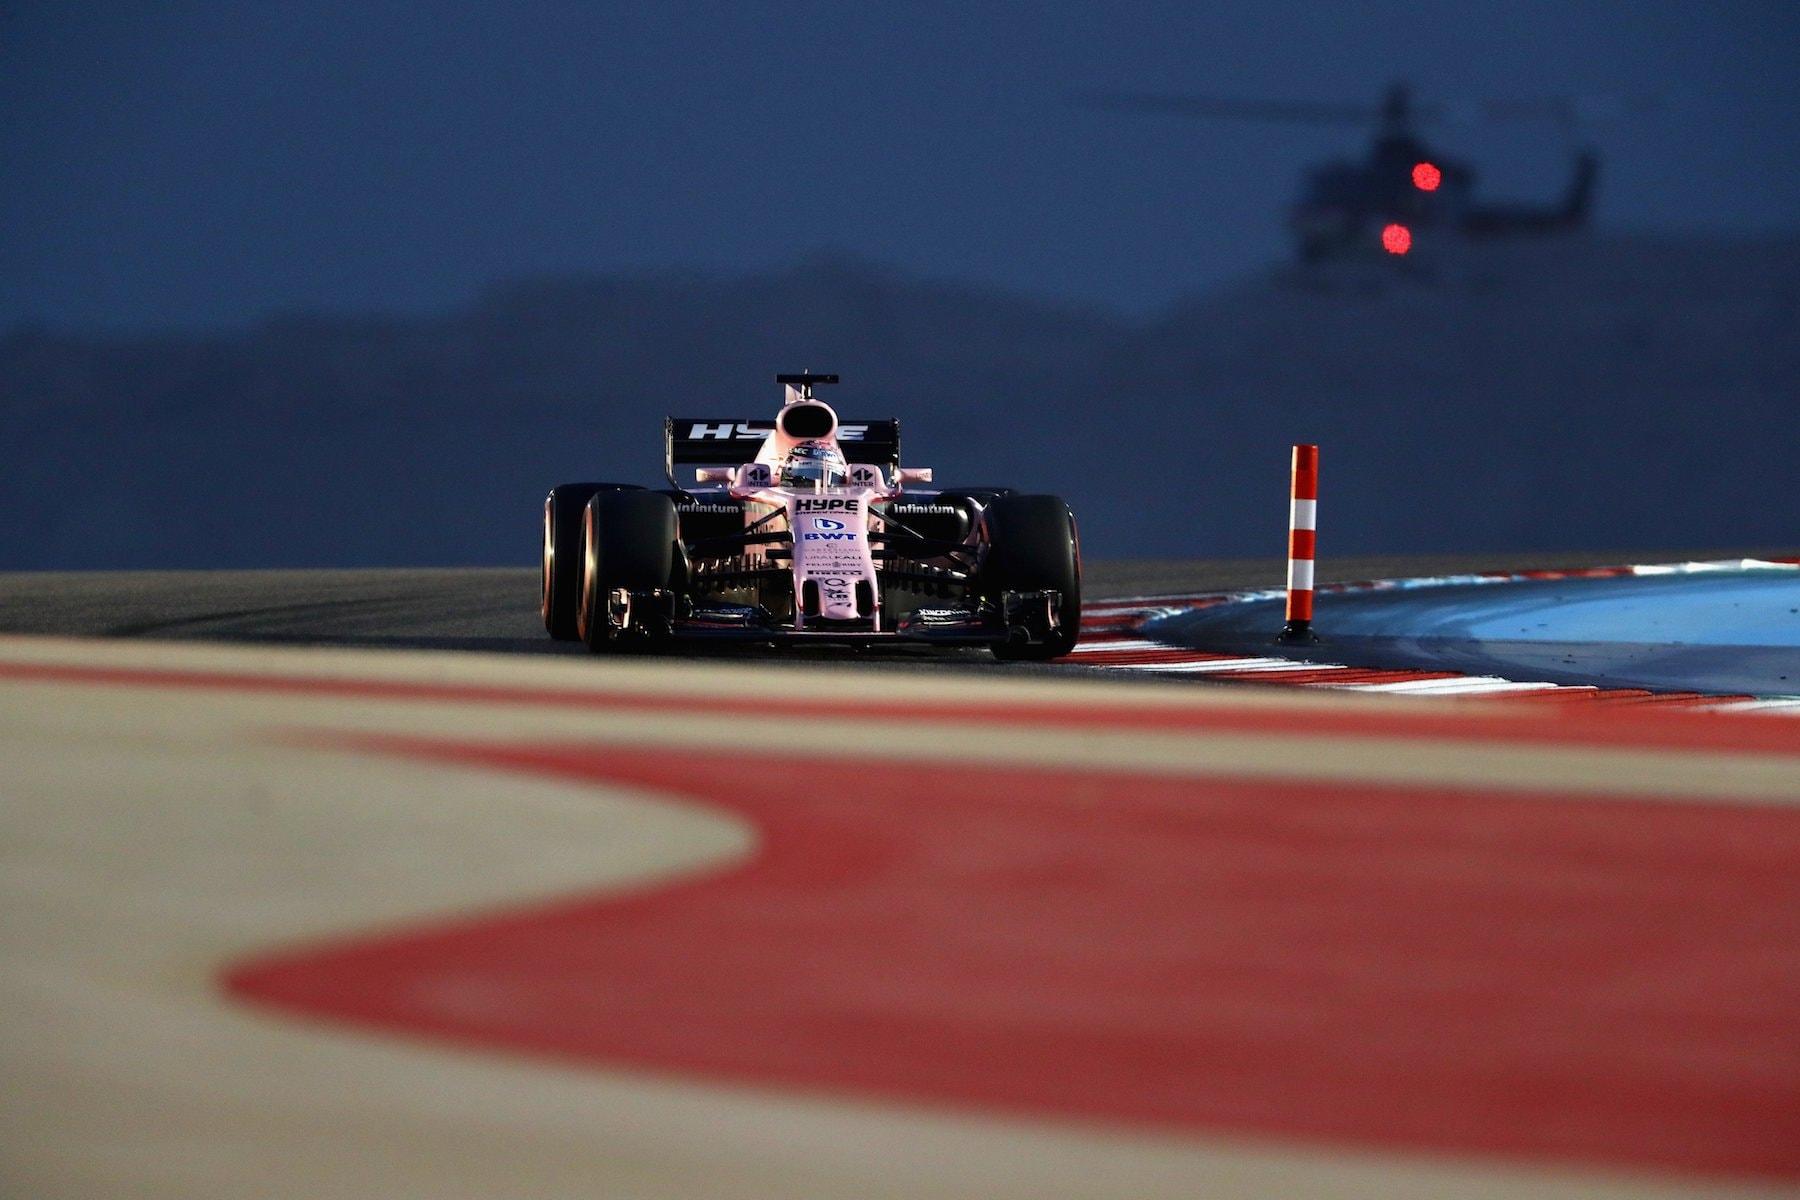 K 2017 Sergio Perez   Force India VJM10   2017 Bahrain GP P 1 copy.jpg